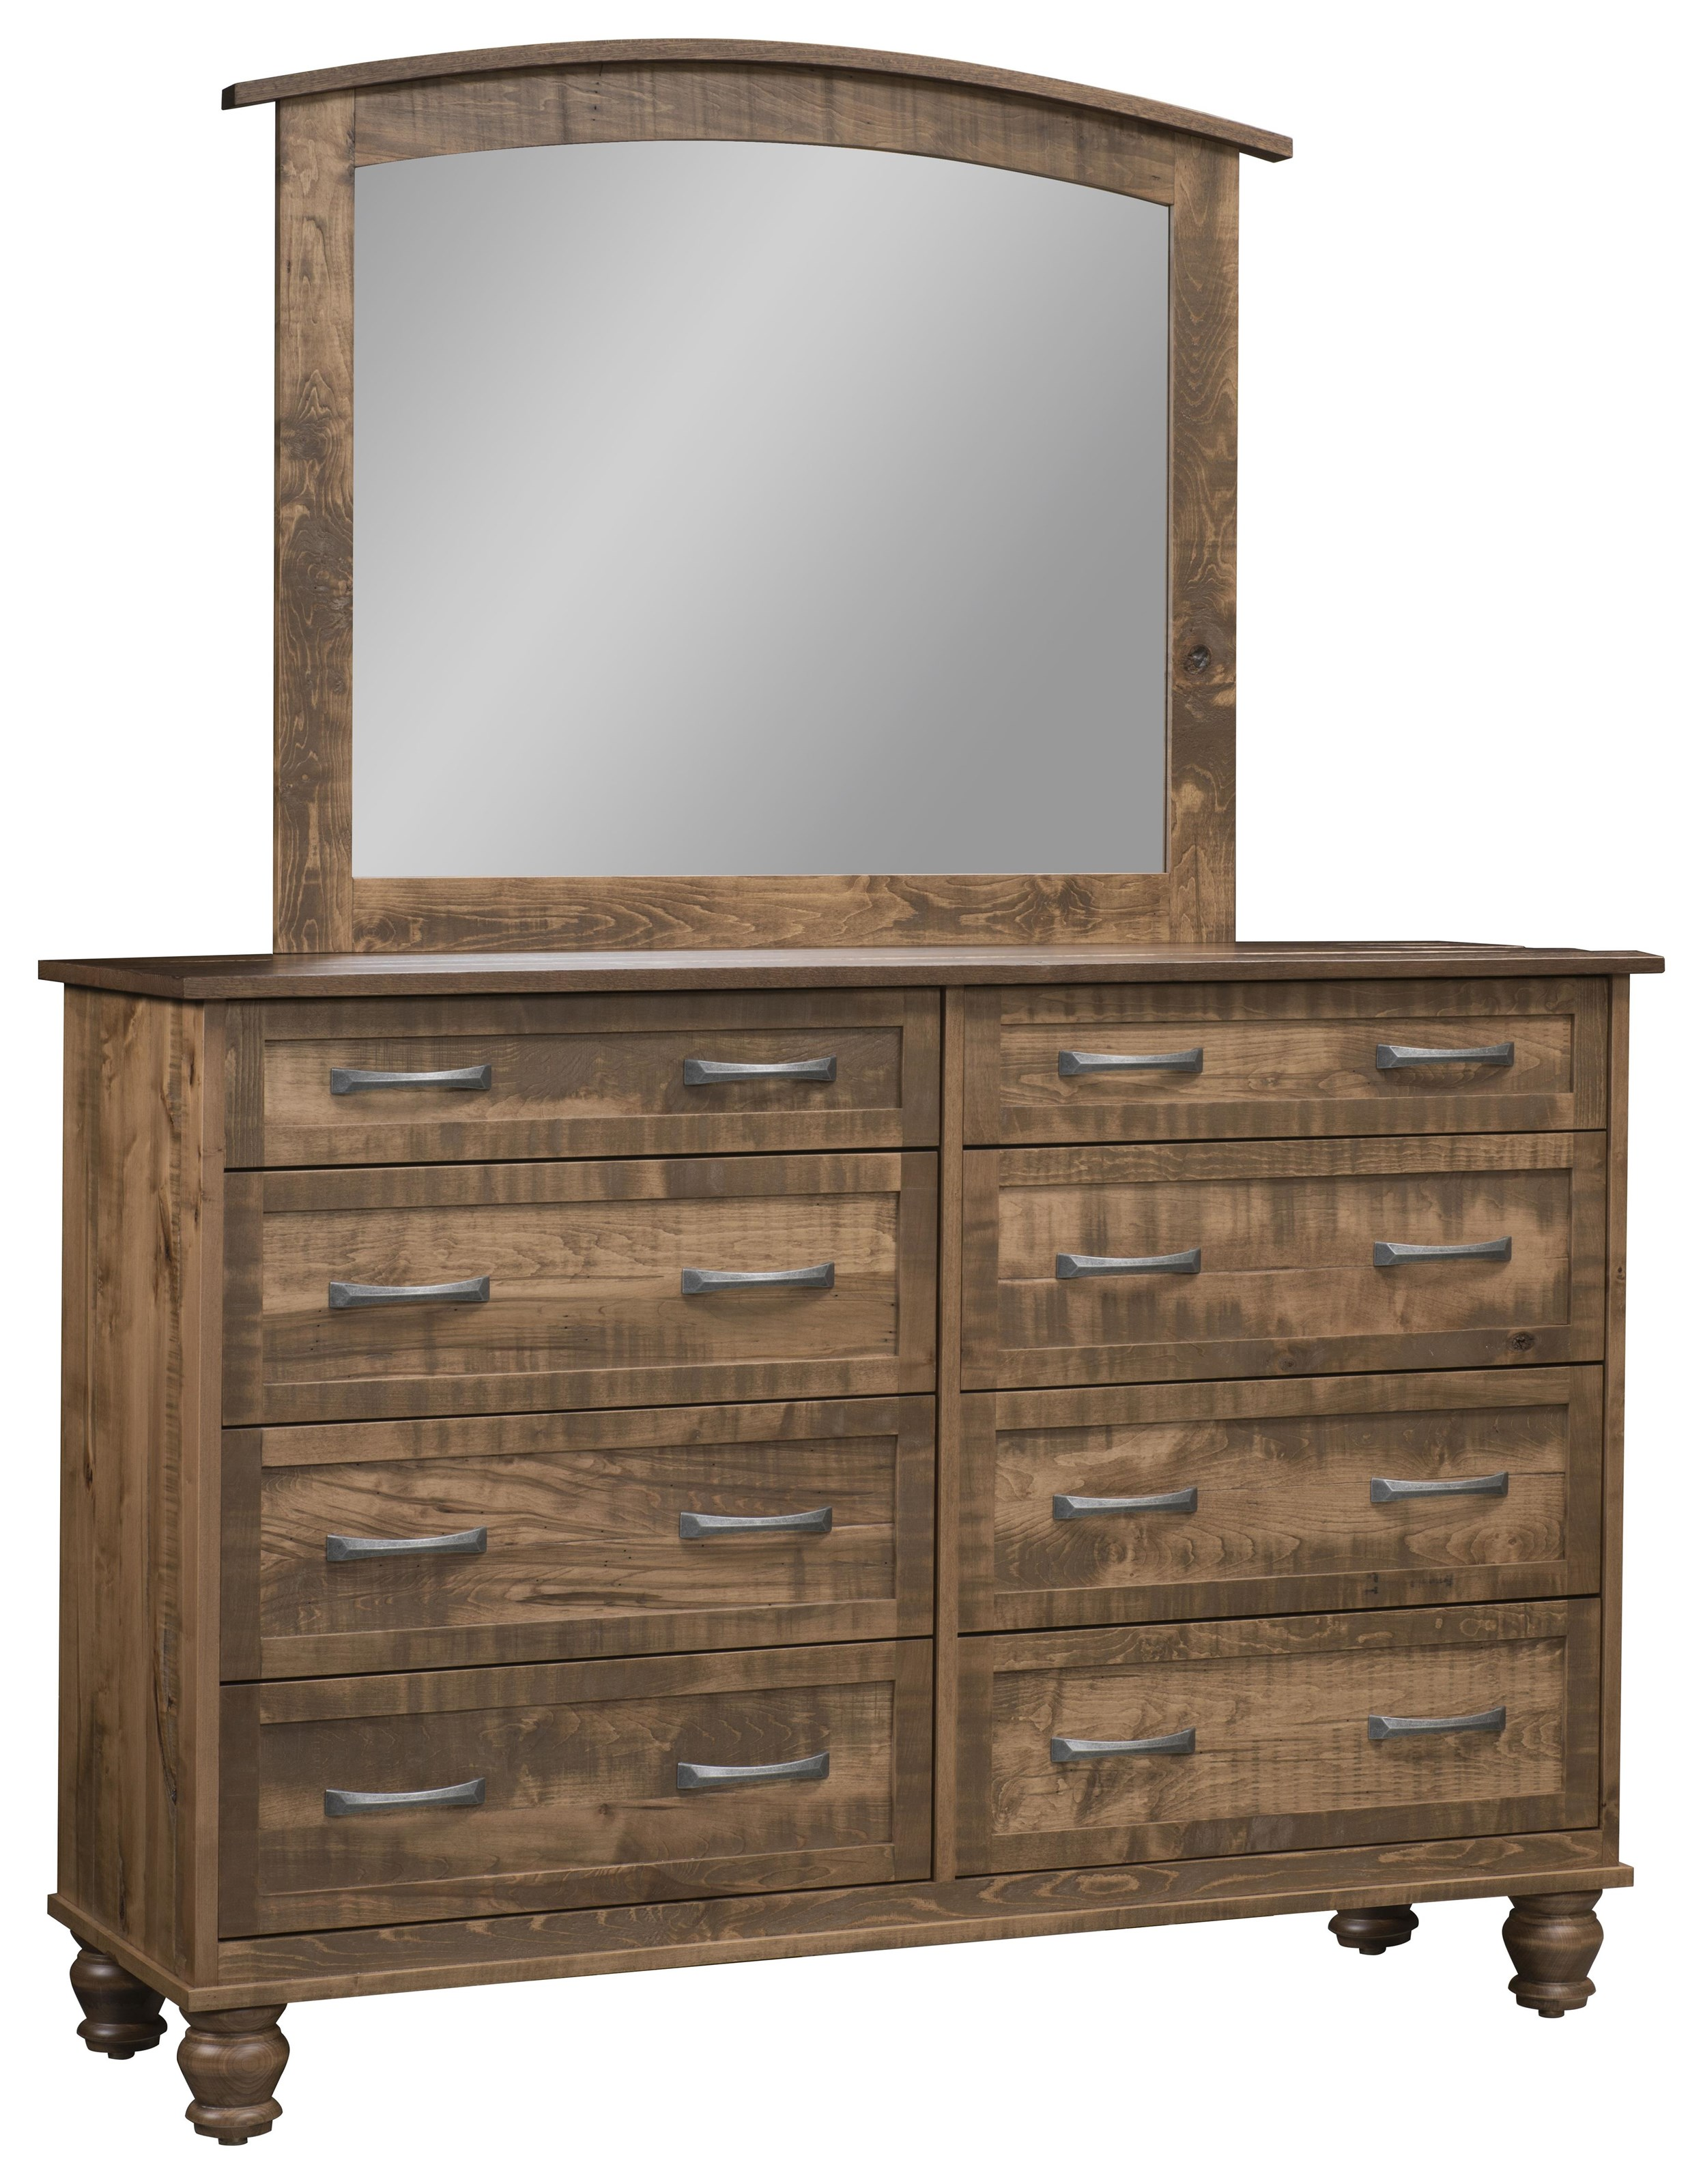 Carson 8 Drawer Mule Dresser & Mirror at Wayside Furniture